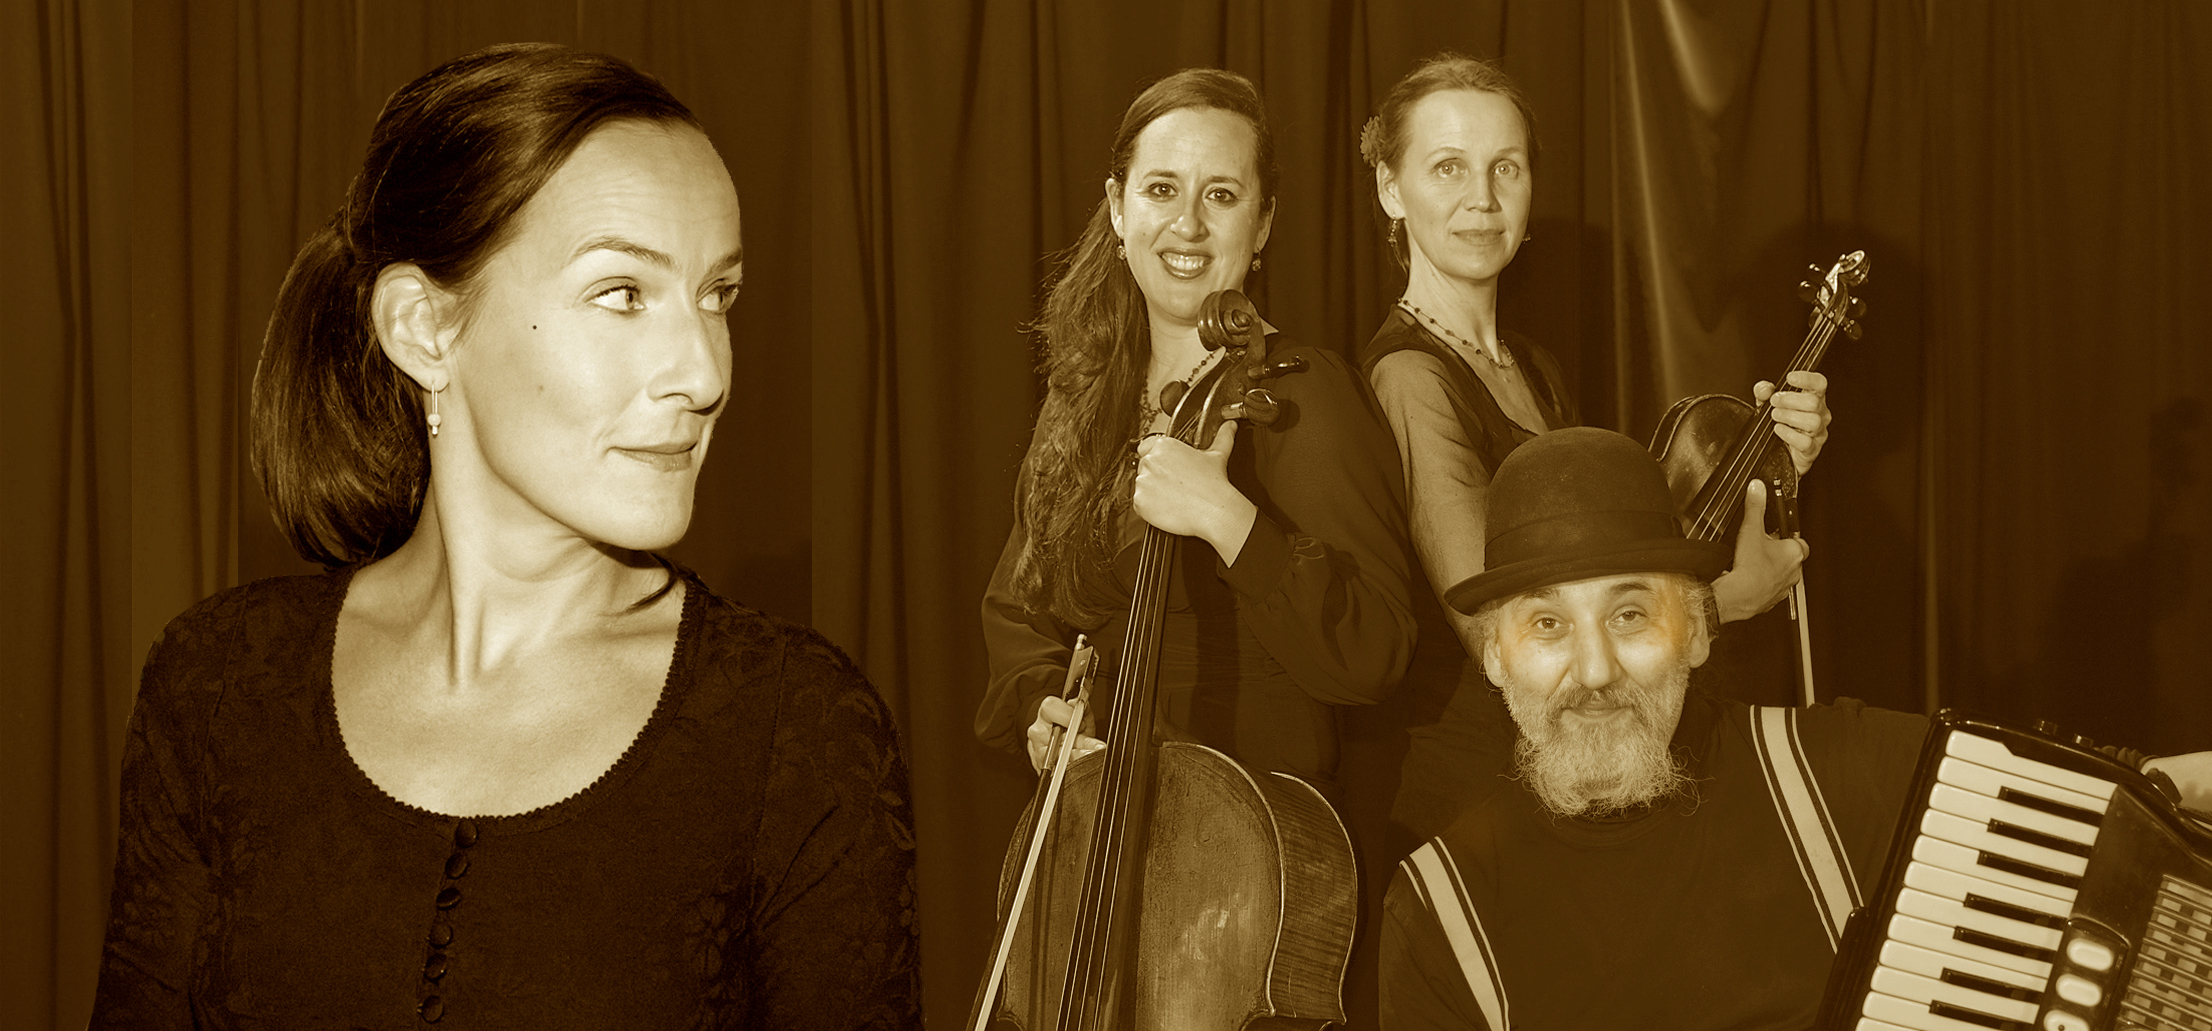 Tangoinpetto - Musik, Tango, Milonga, Stuttgart, Killesberg